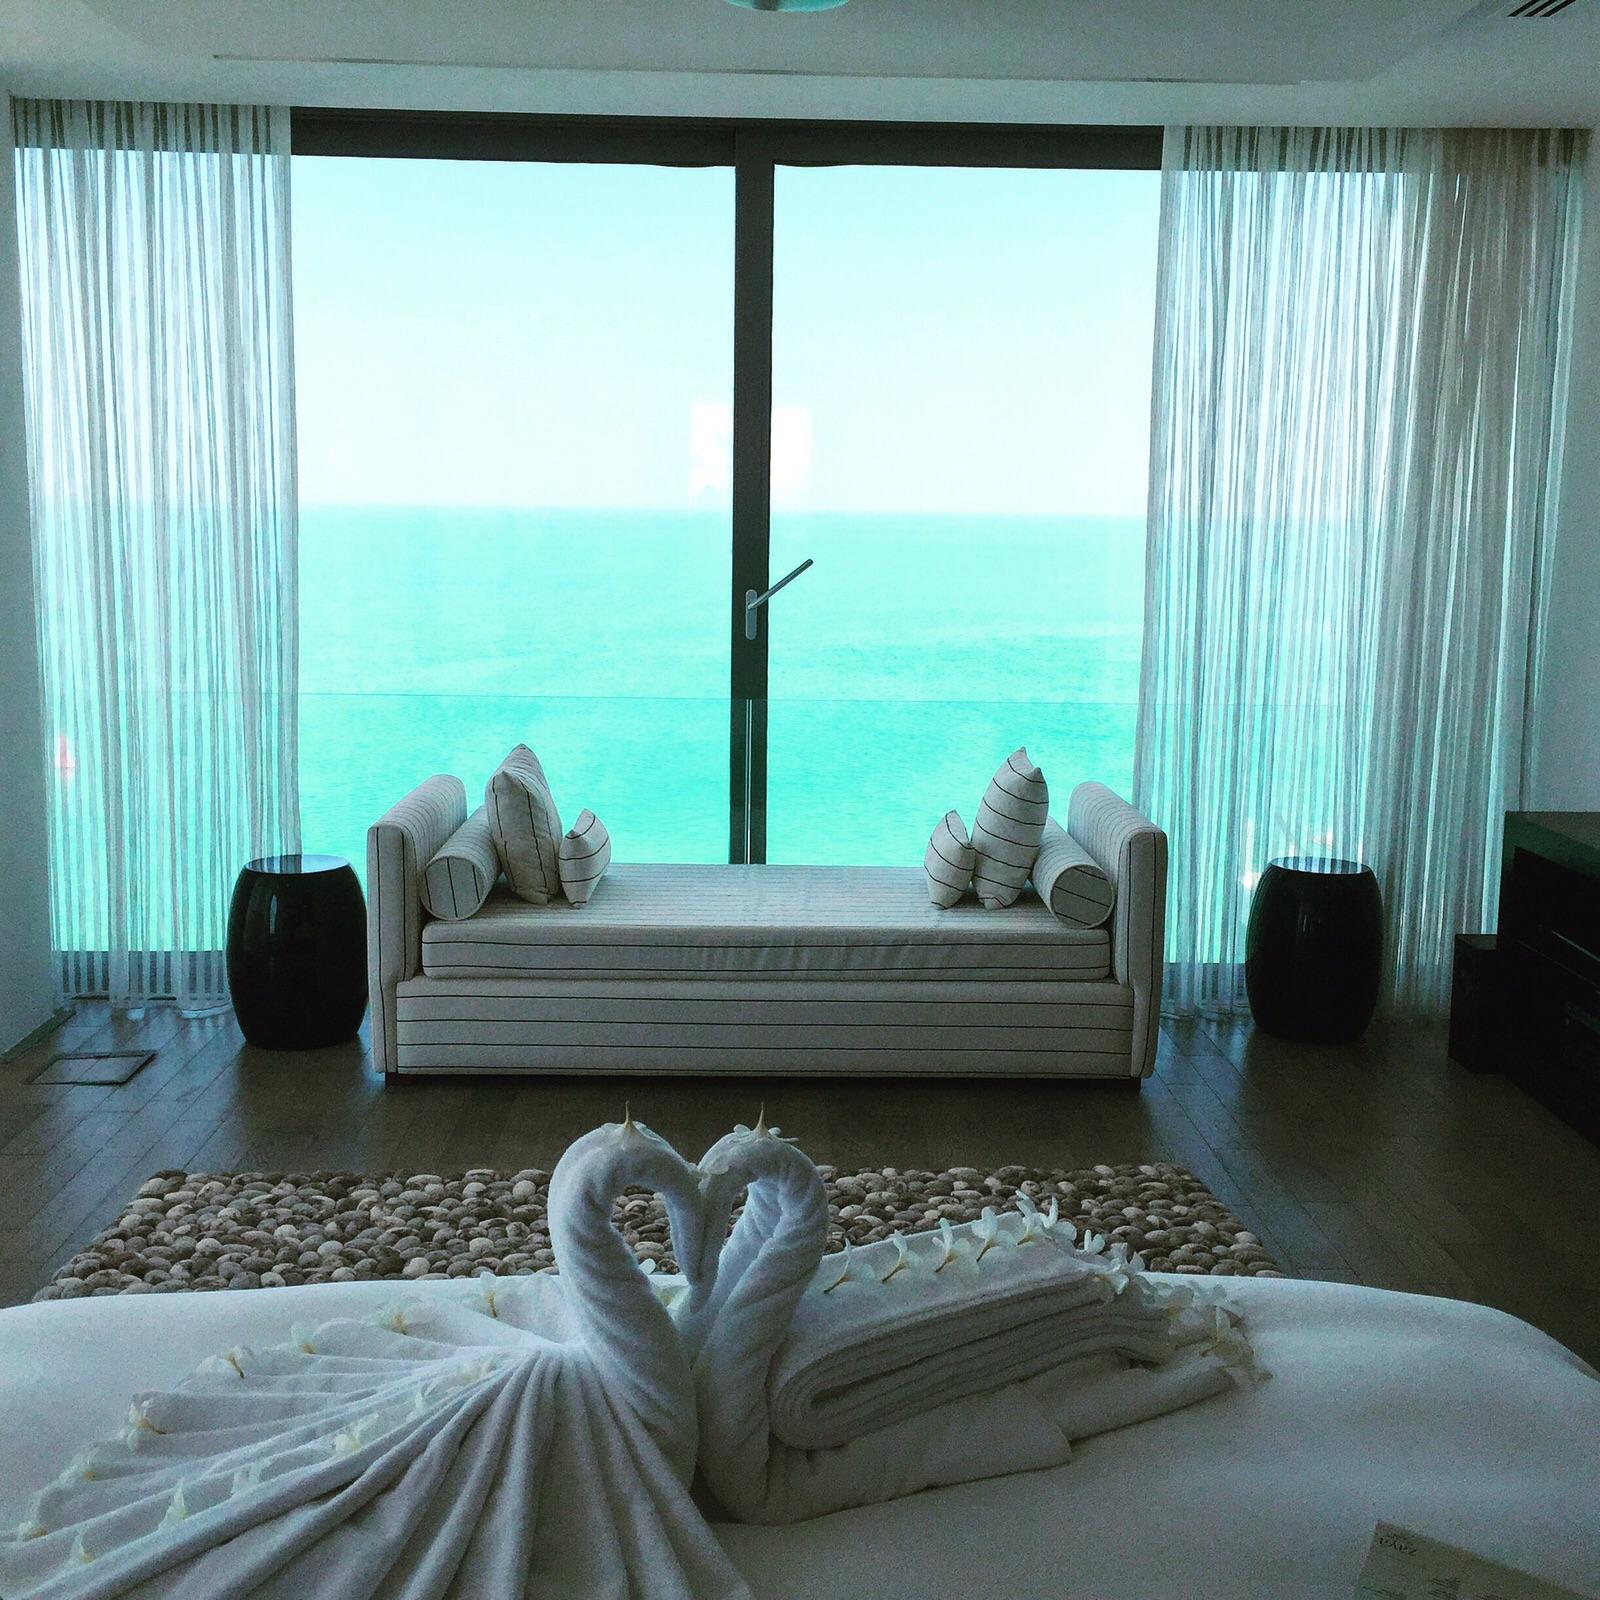 zaya nurai resort bedroom, Dubai, Middle East, Pierchic, zaya nurai, zaya nurai resort